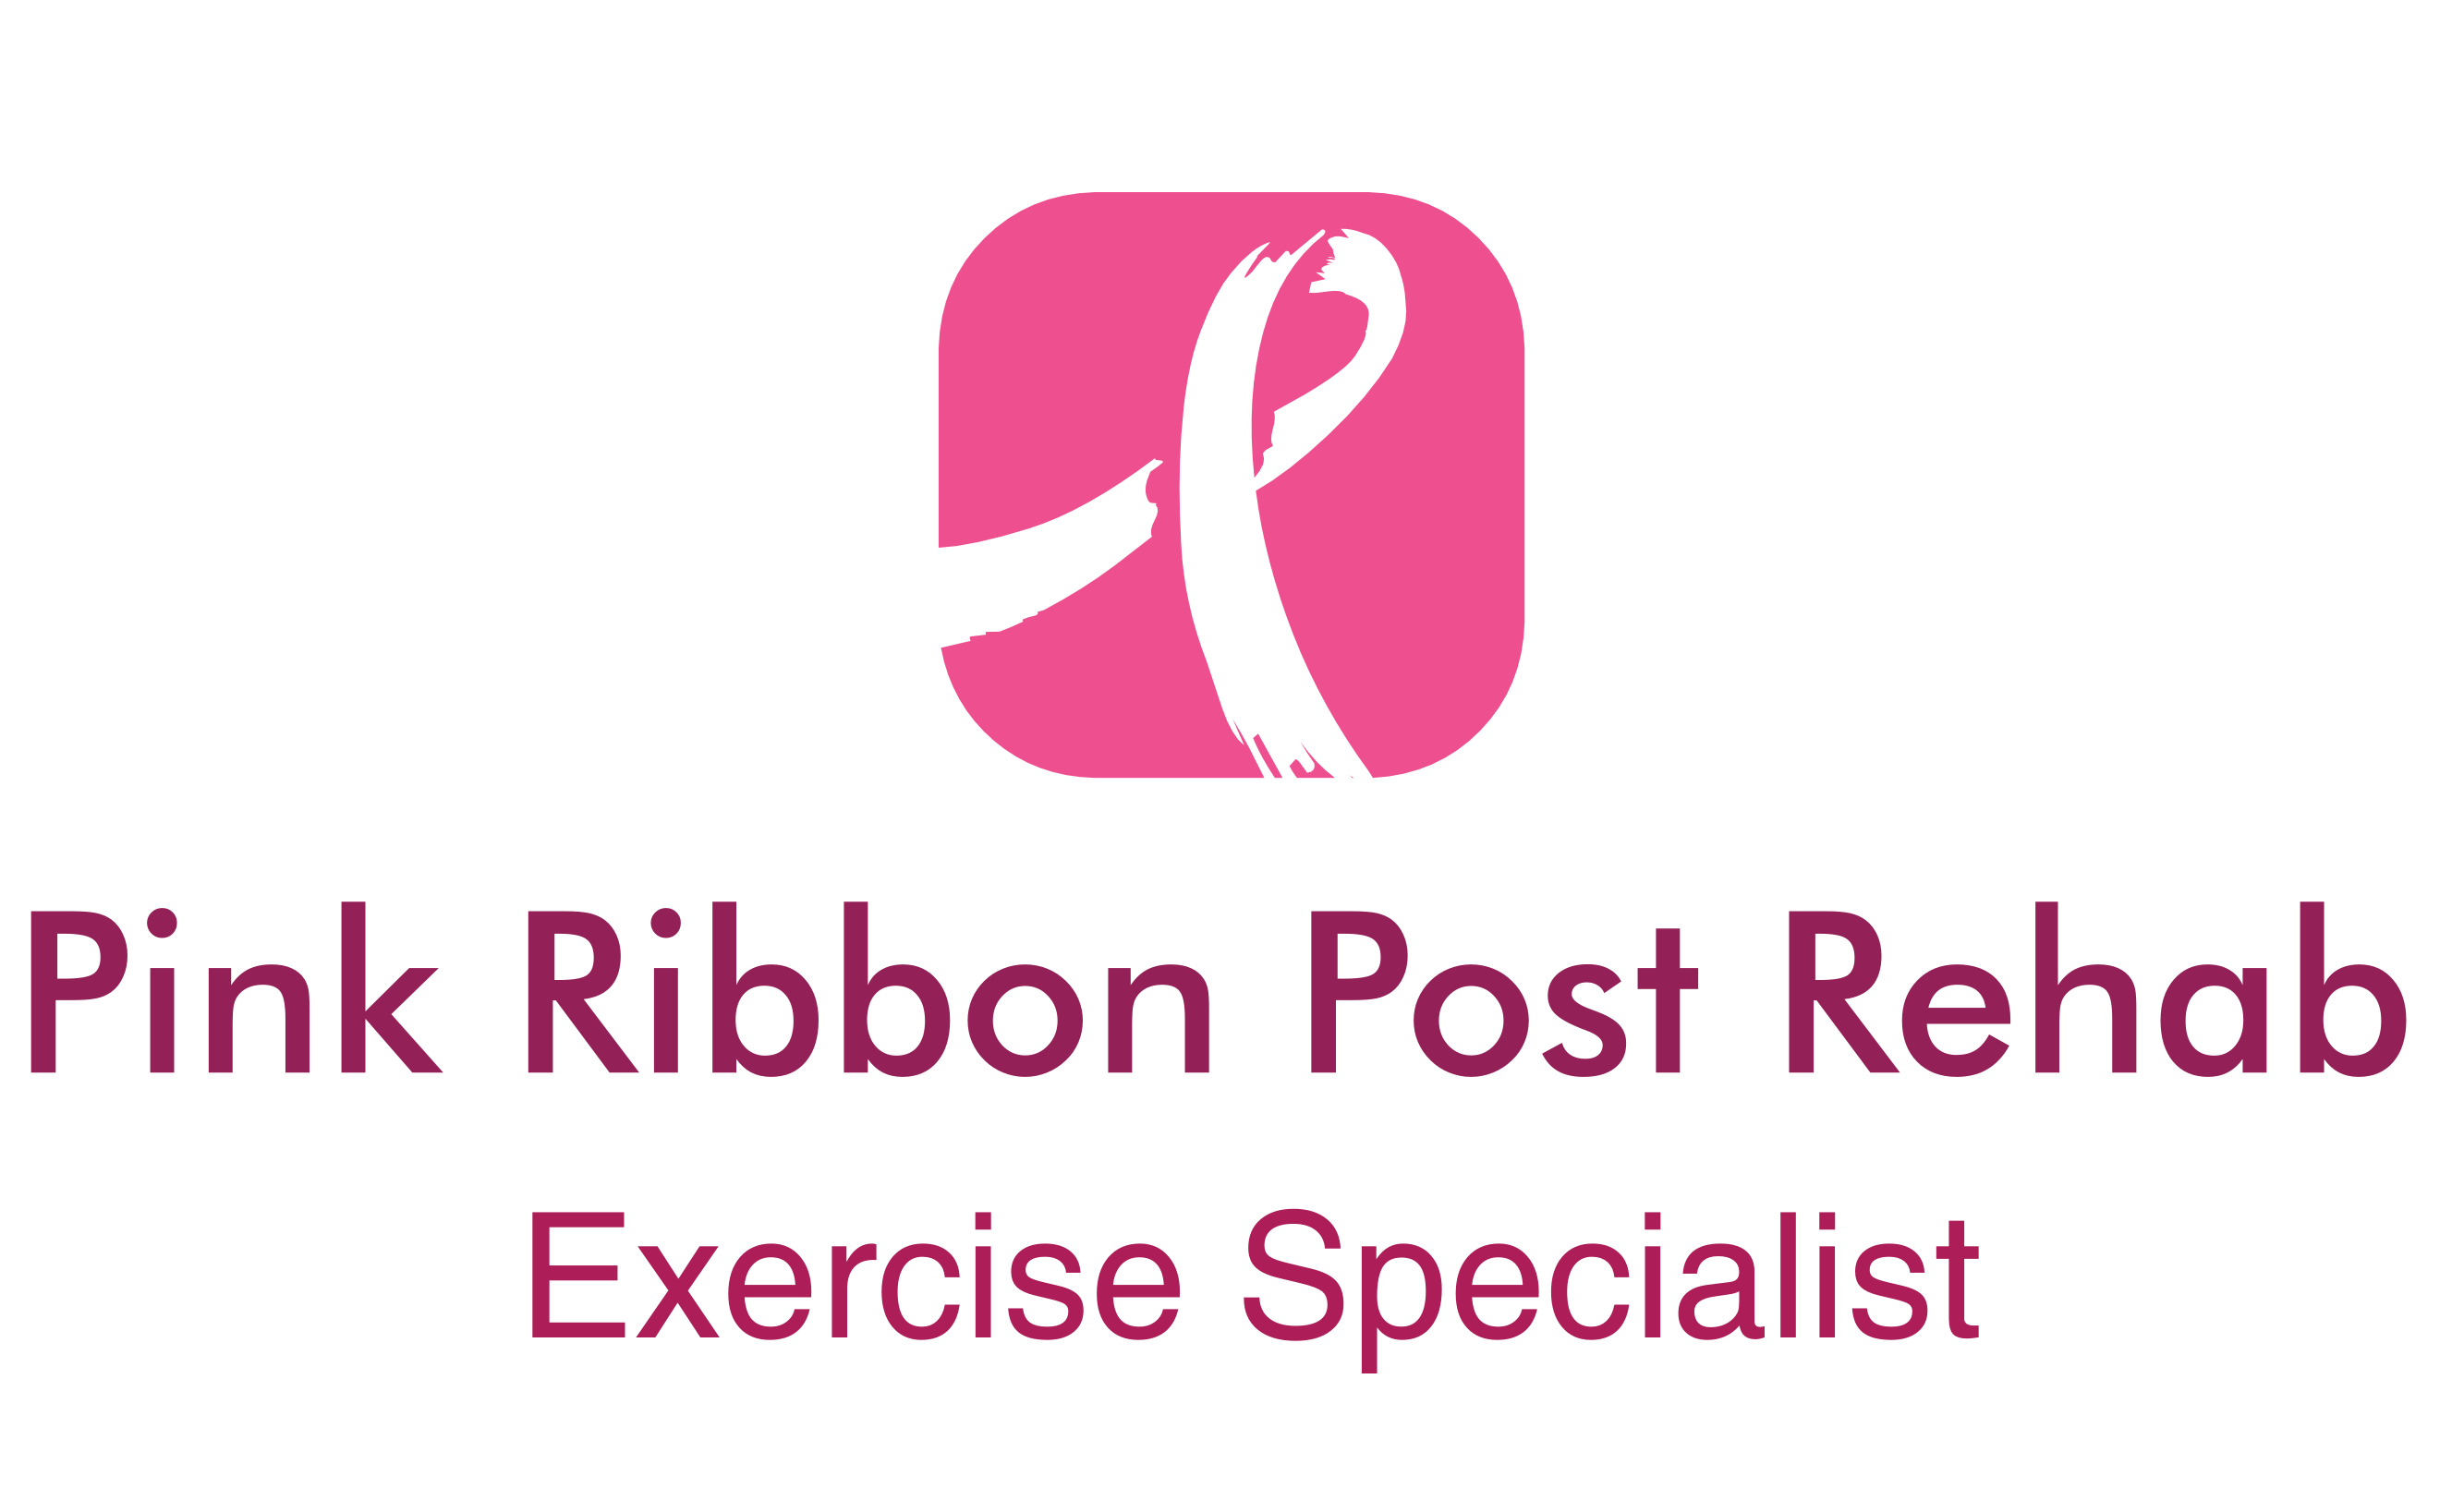 Pink Ribbon Post Rehab